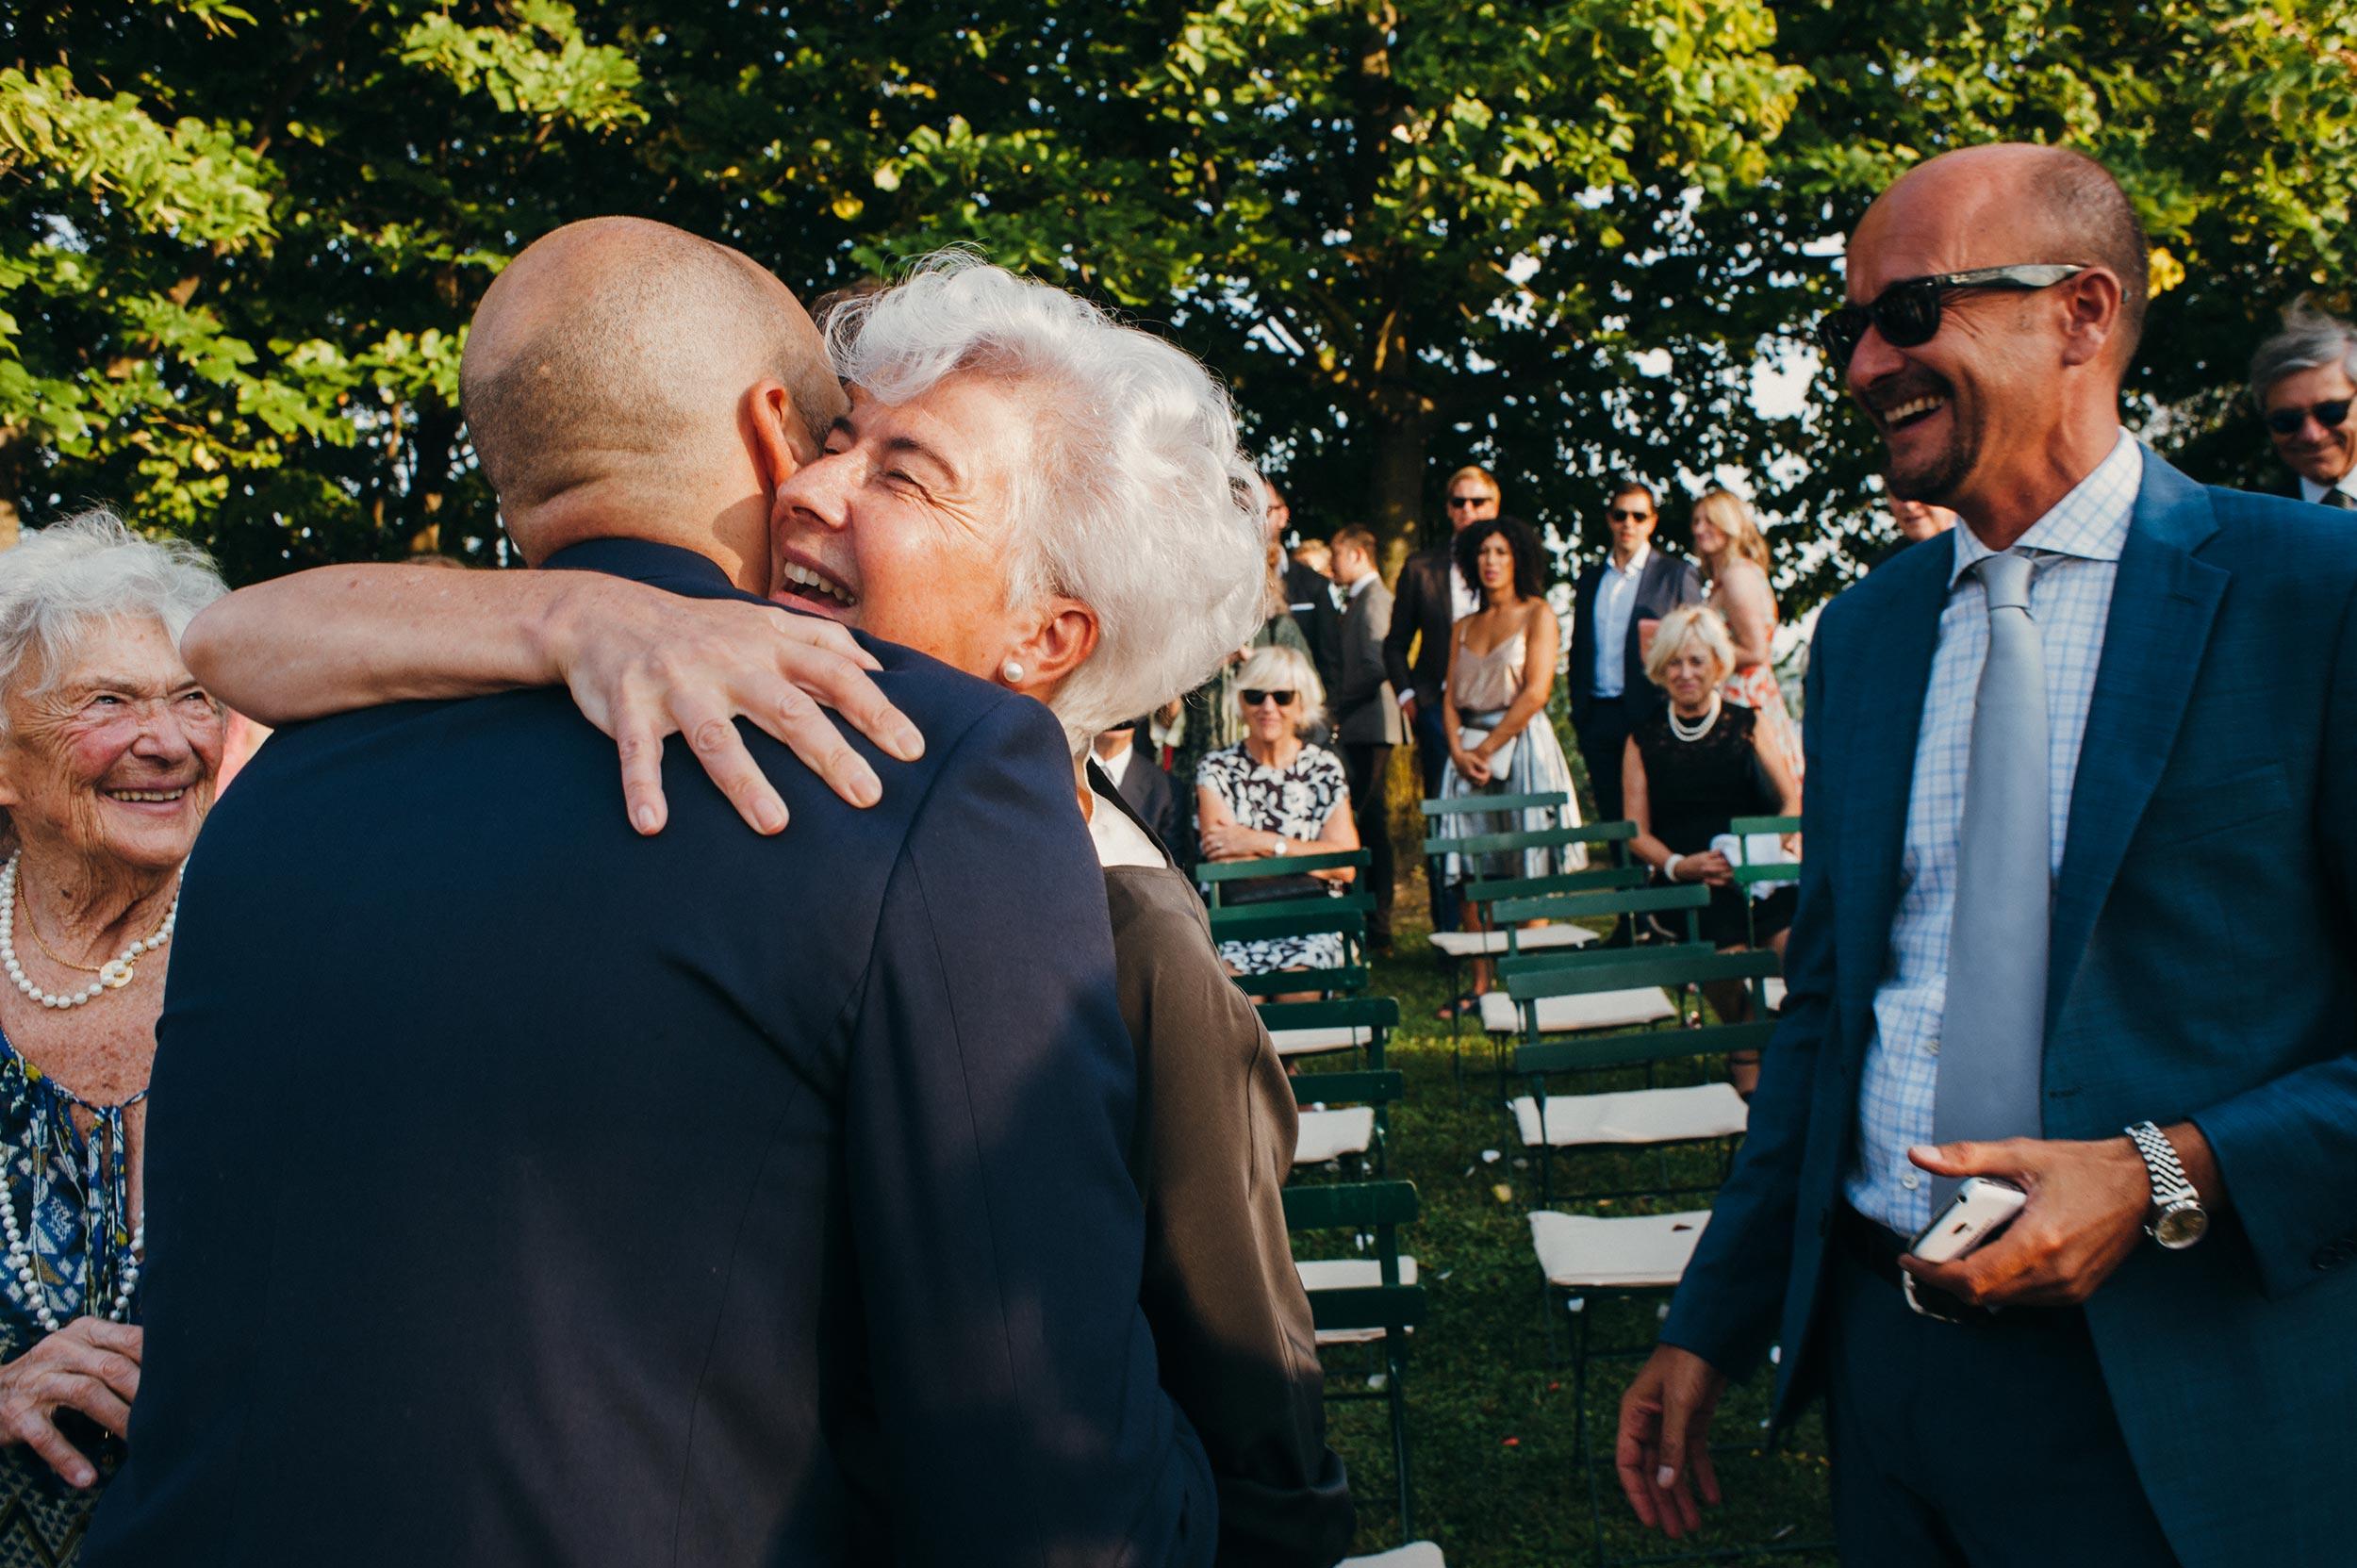 2016-Davor-Chiara-Monferrato-Asti-Vercelli-Wedding-Photographer-Italy-Alessandro-Avenali-38.jpg